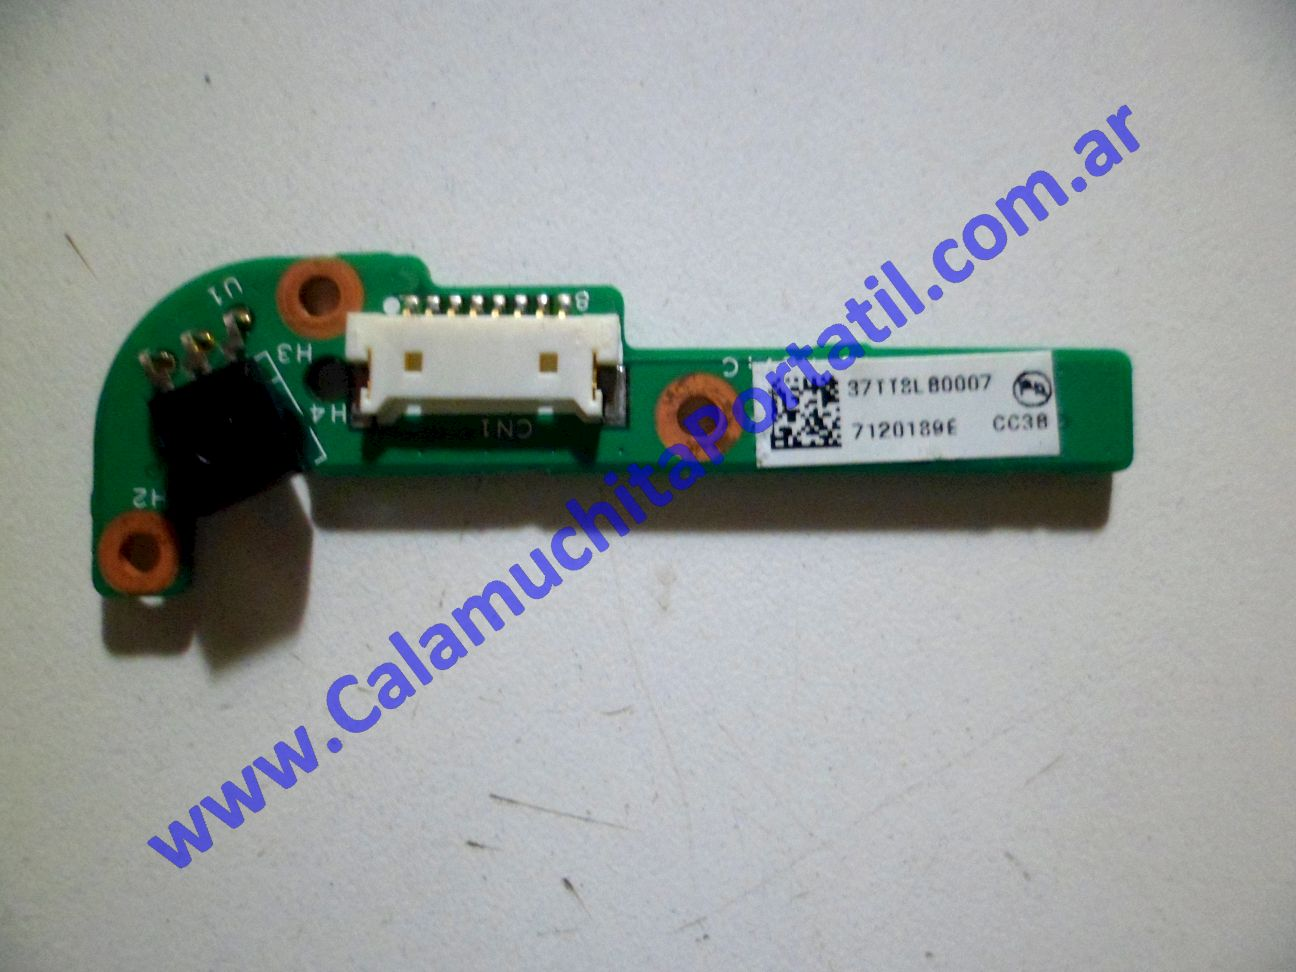 0014PLE Placa Leds Hewlett Packard Pavilion TX1000 / TX1030la